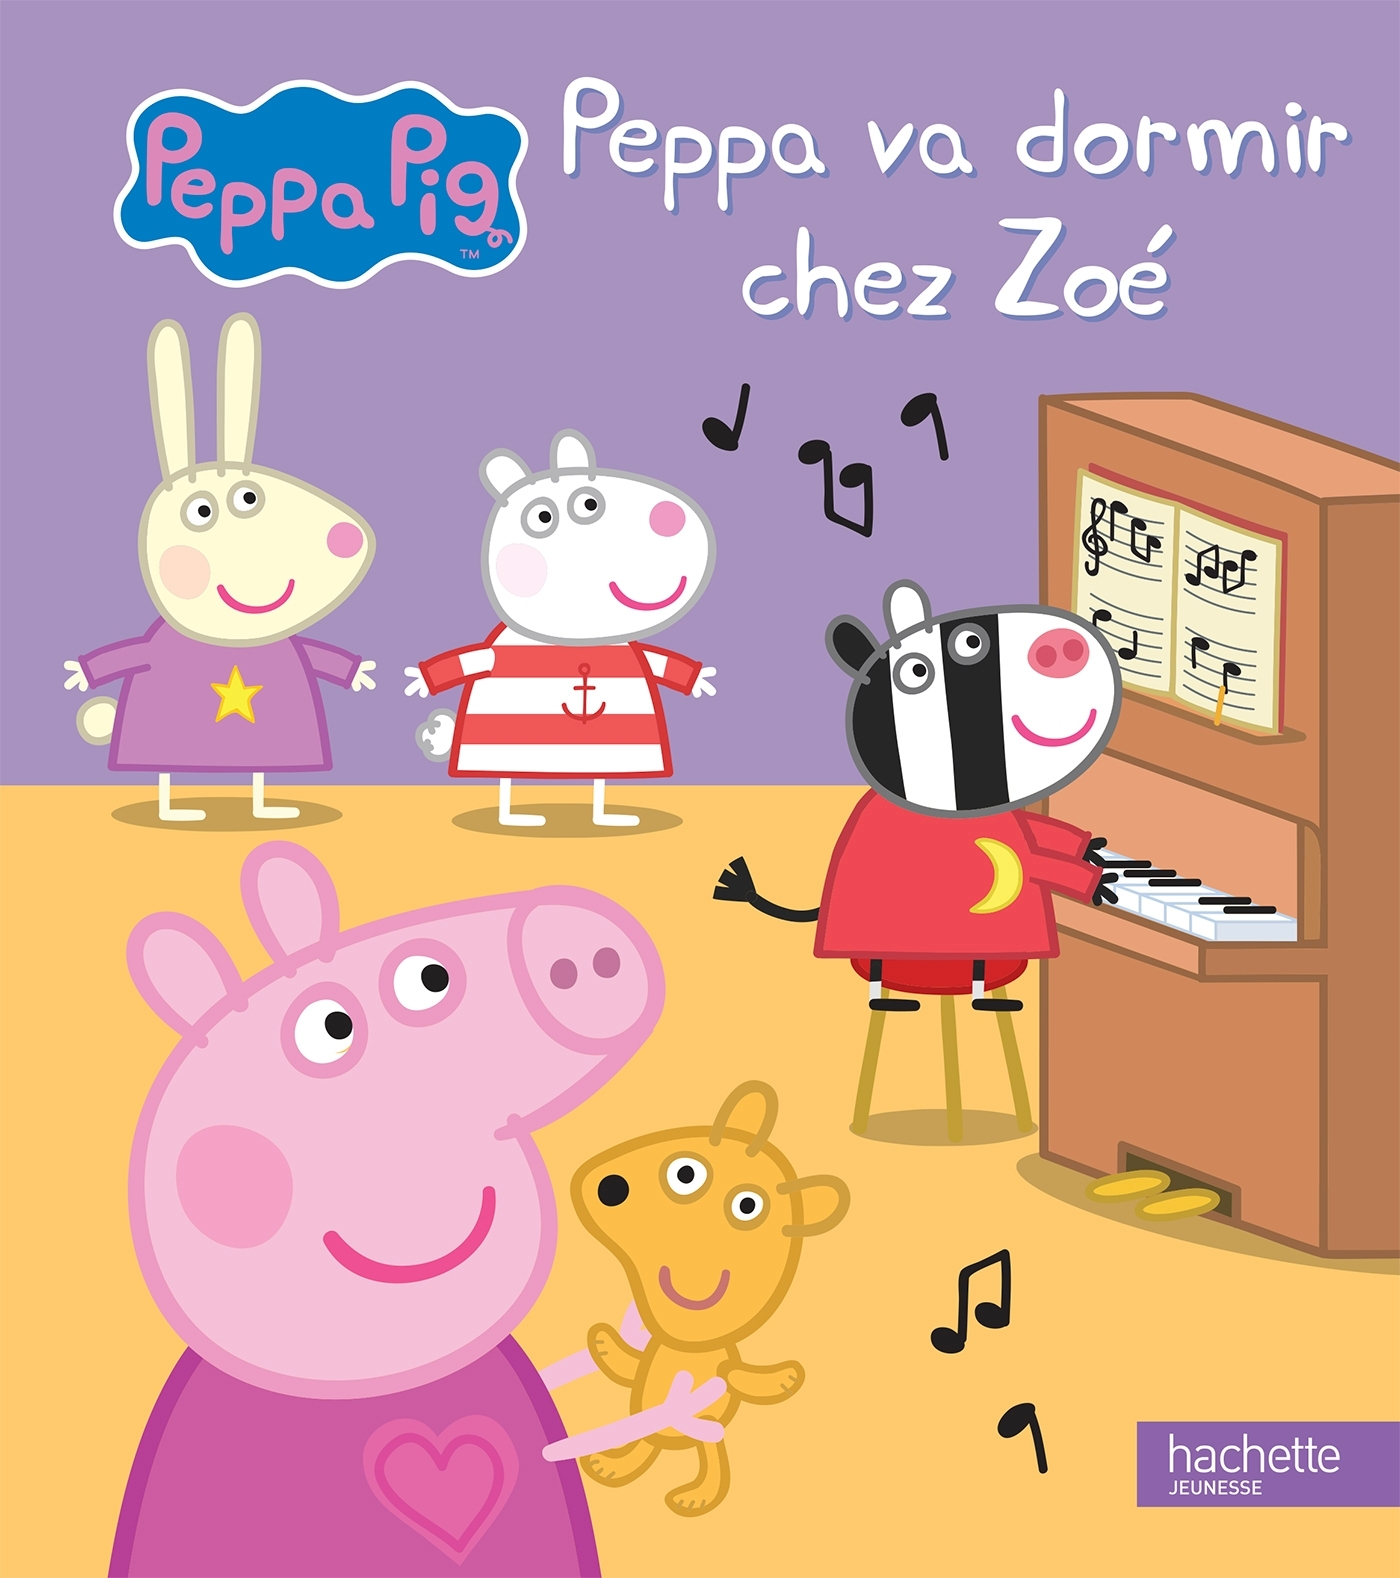 PEPPA PIG - PEPPA VA DORMIR CHEZ ZOE